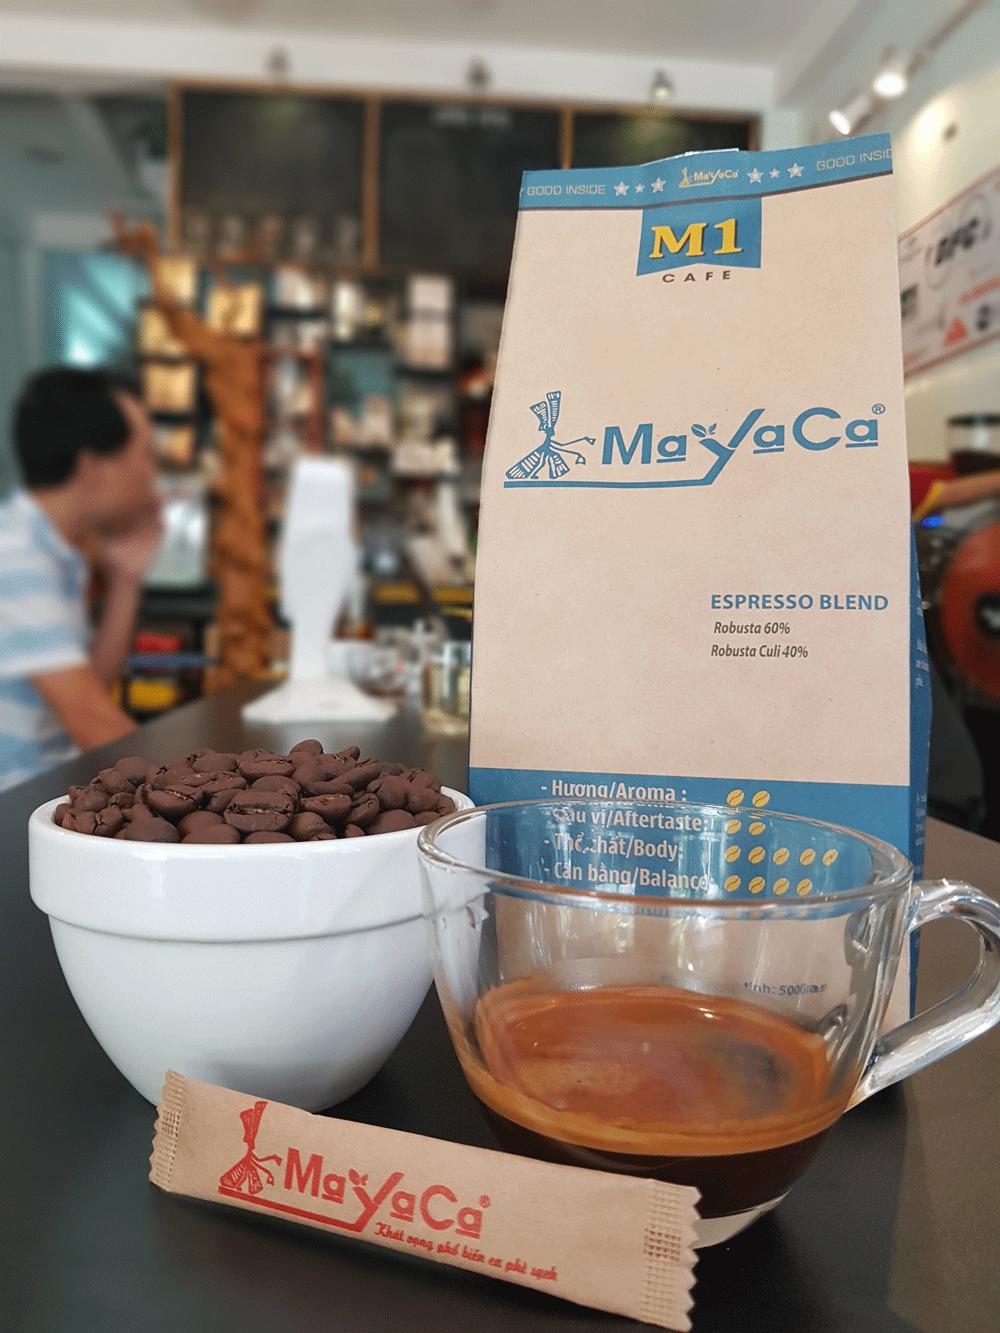 mayaca-coffee-m1-2